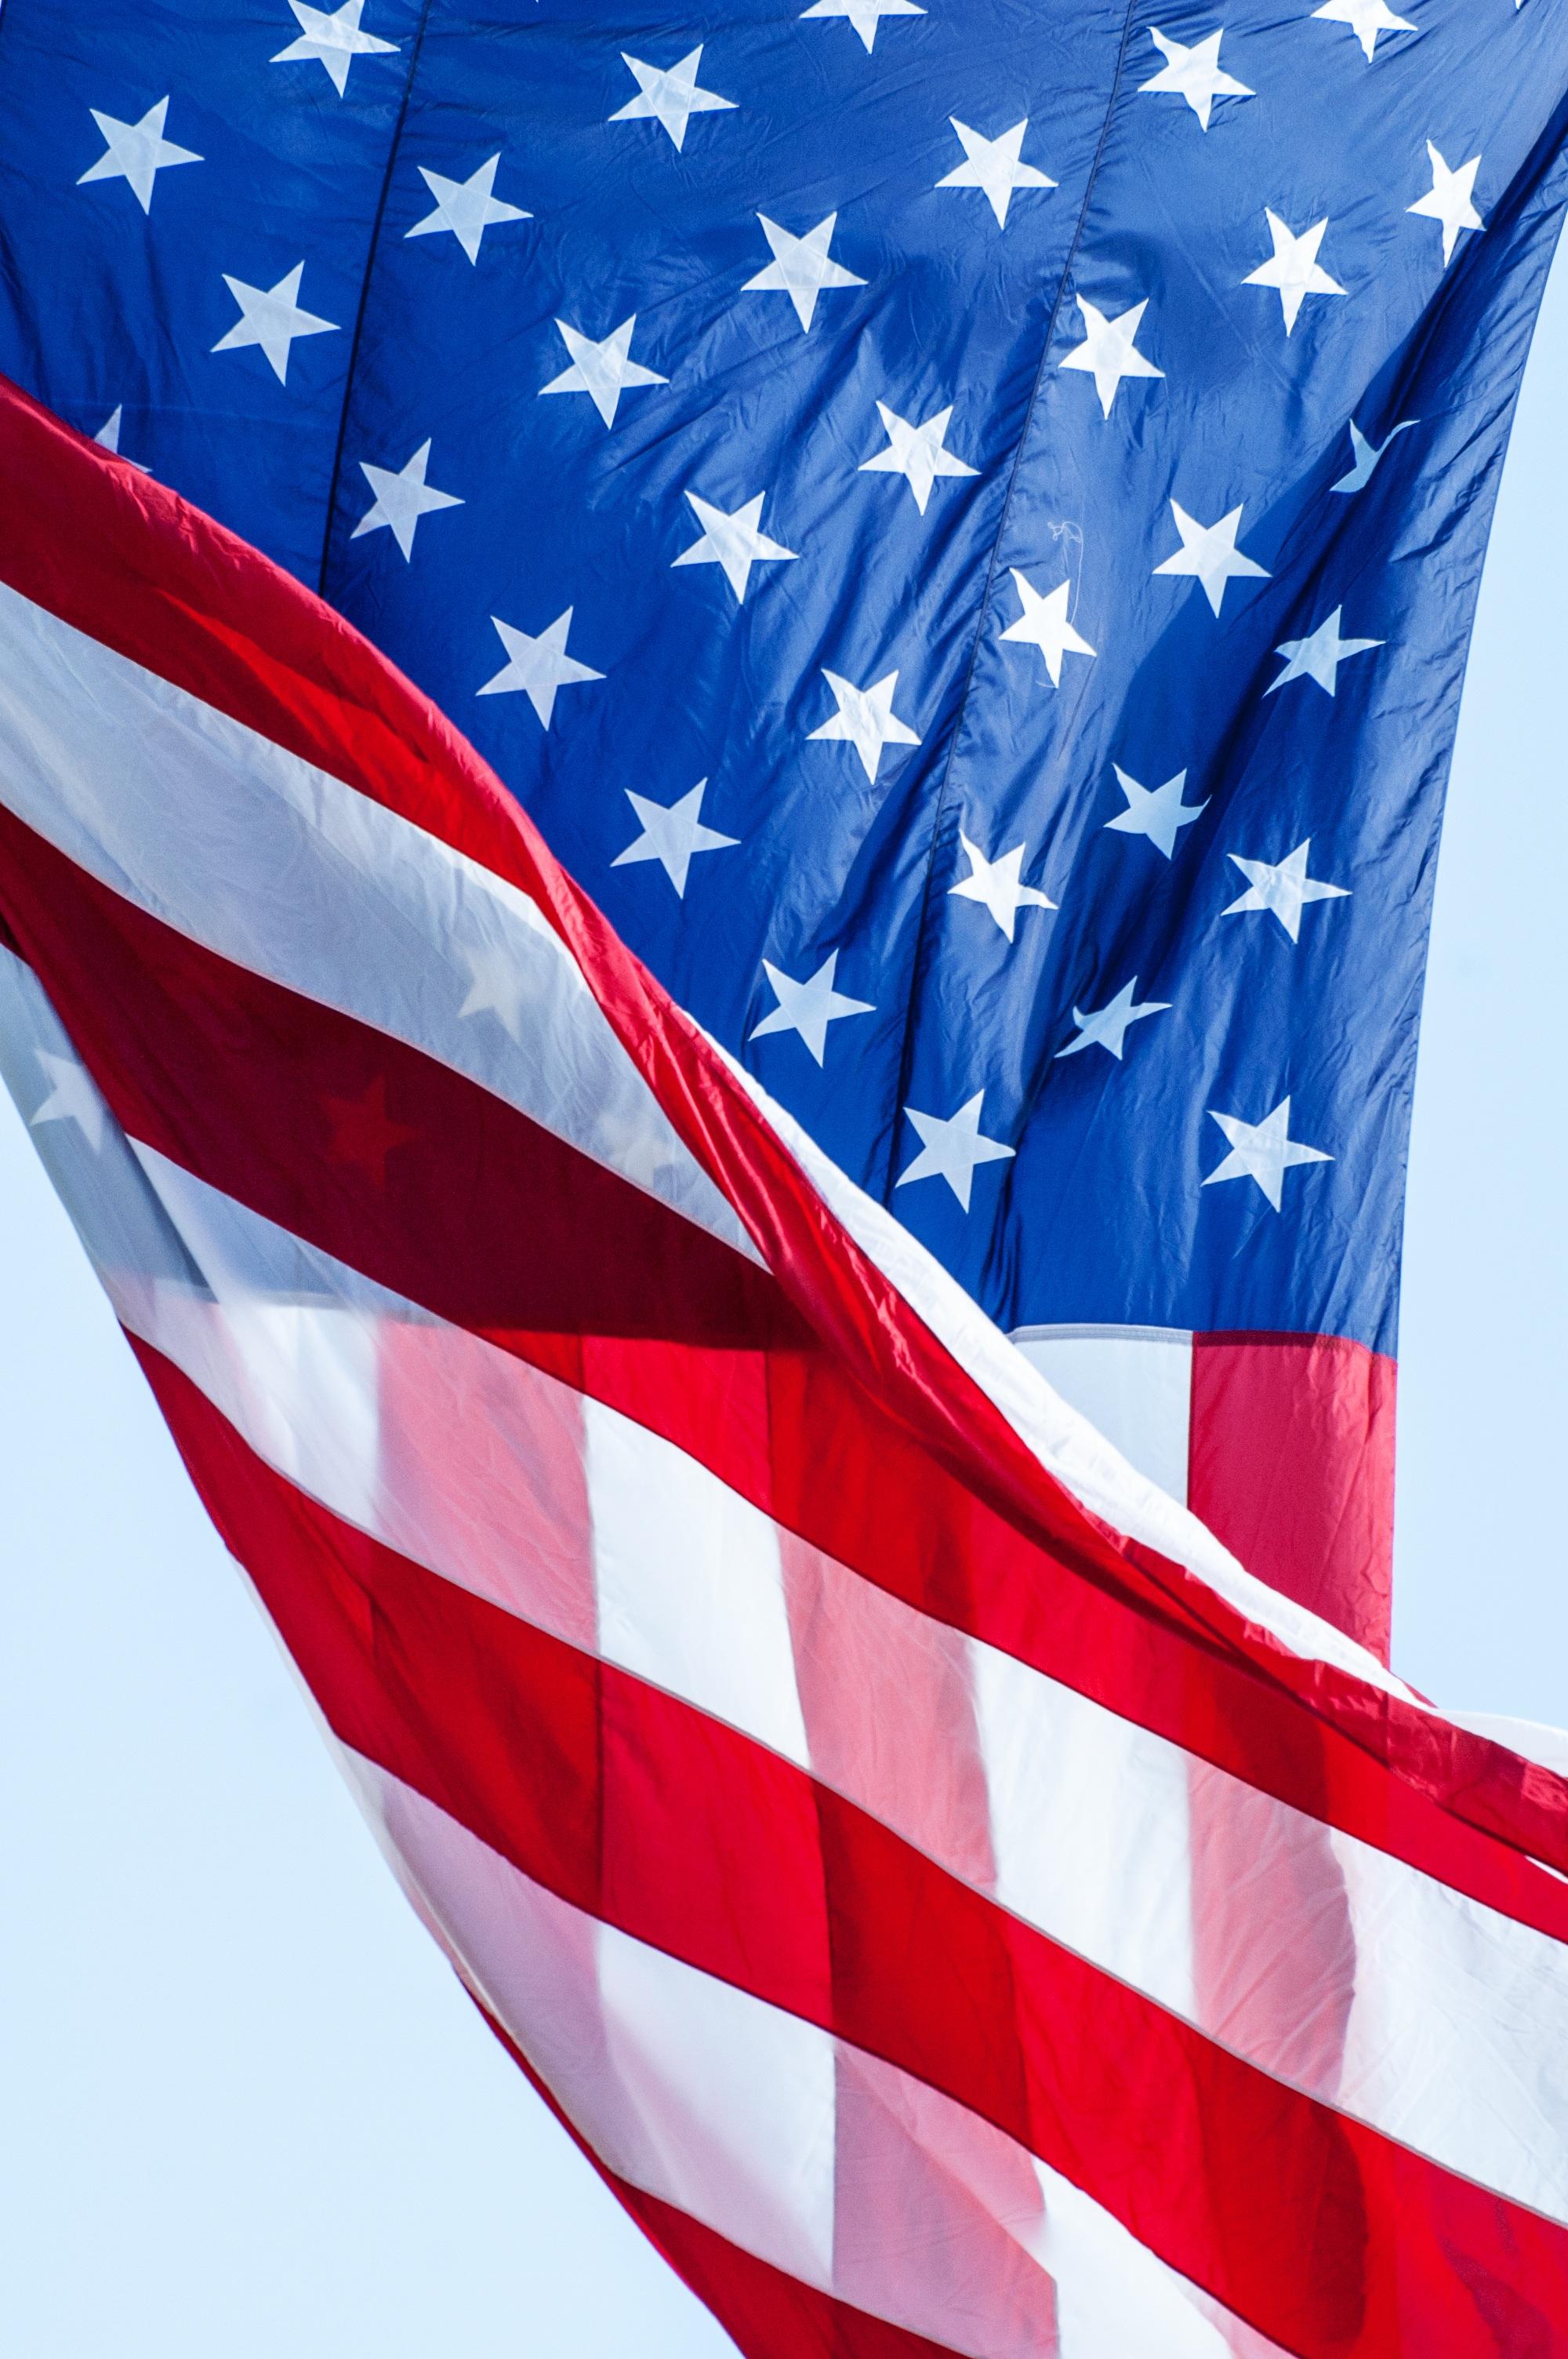 Free Images   White  Red  American Flag  Blue  Patriotism